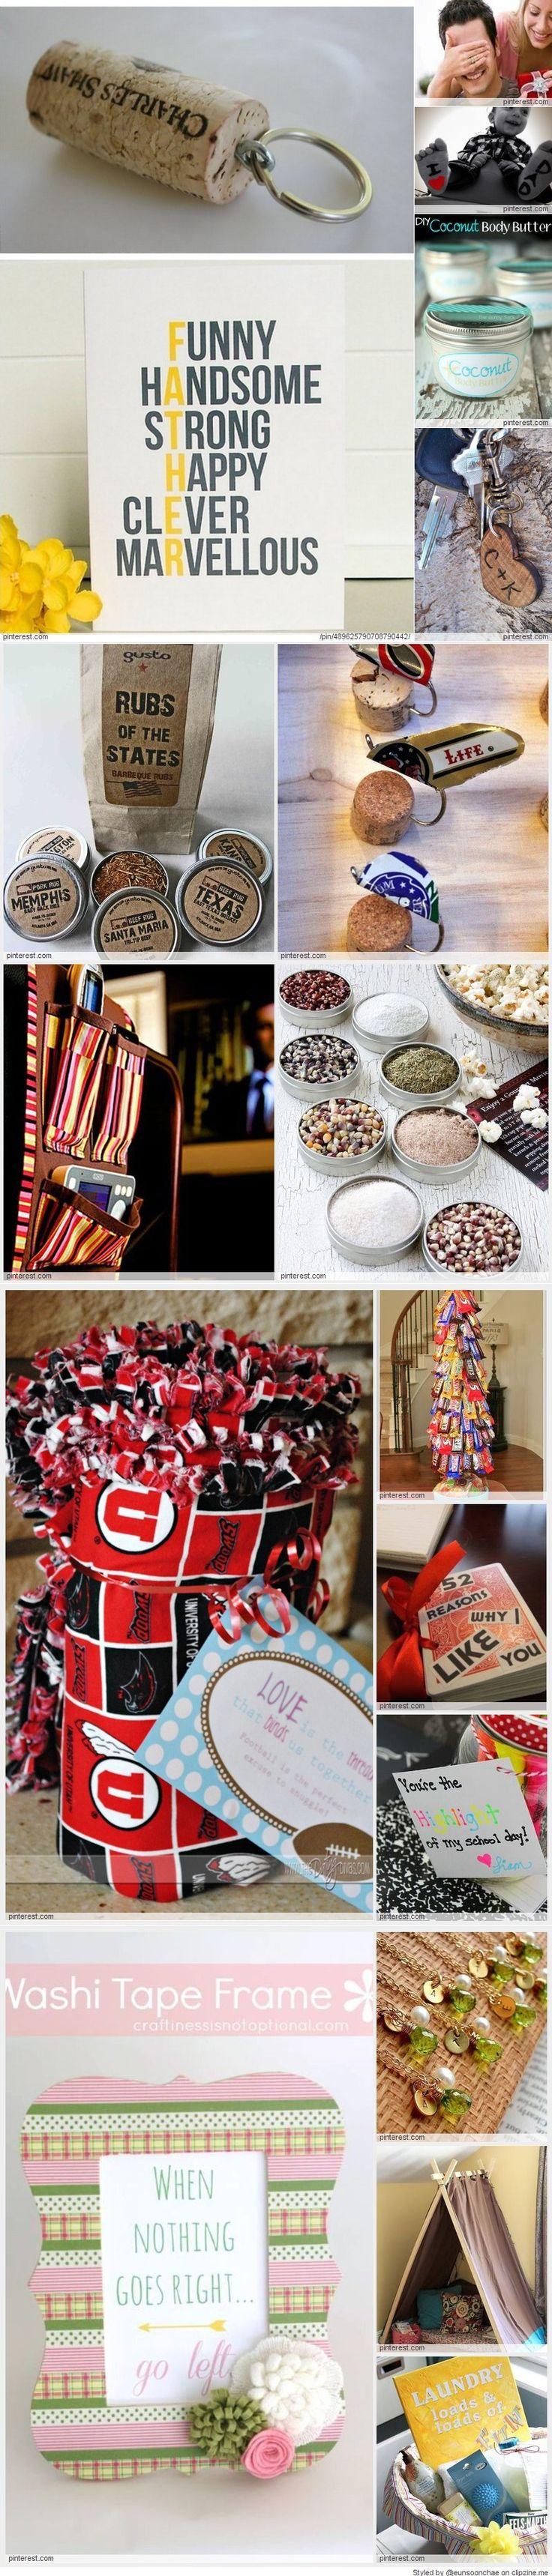 1073 best auch süß images on Pinterest | Craft ideas, Crafts for ...